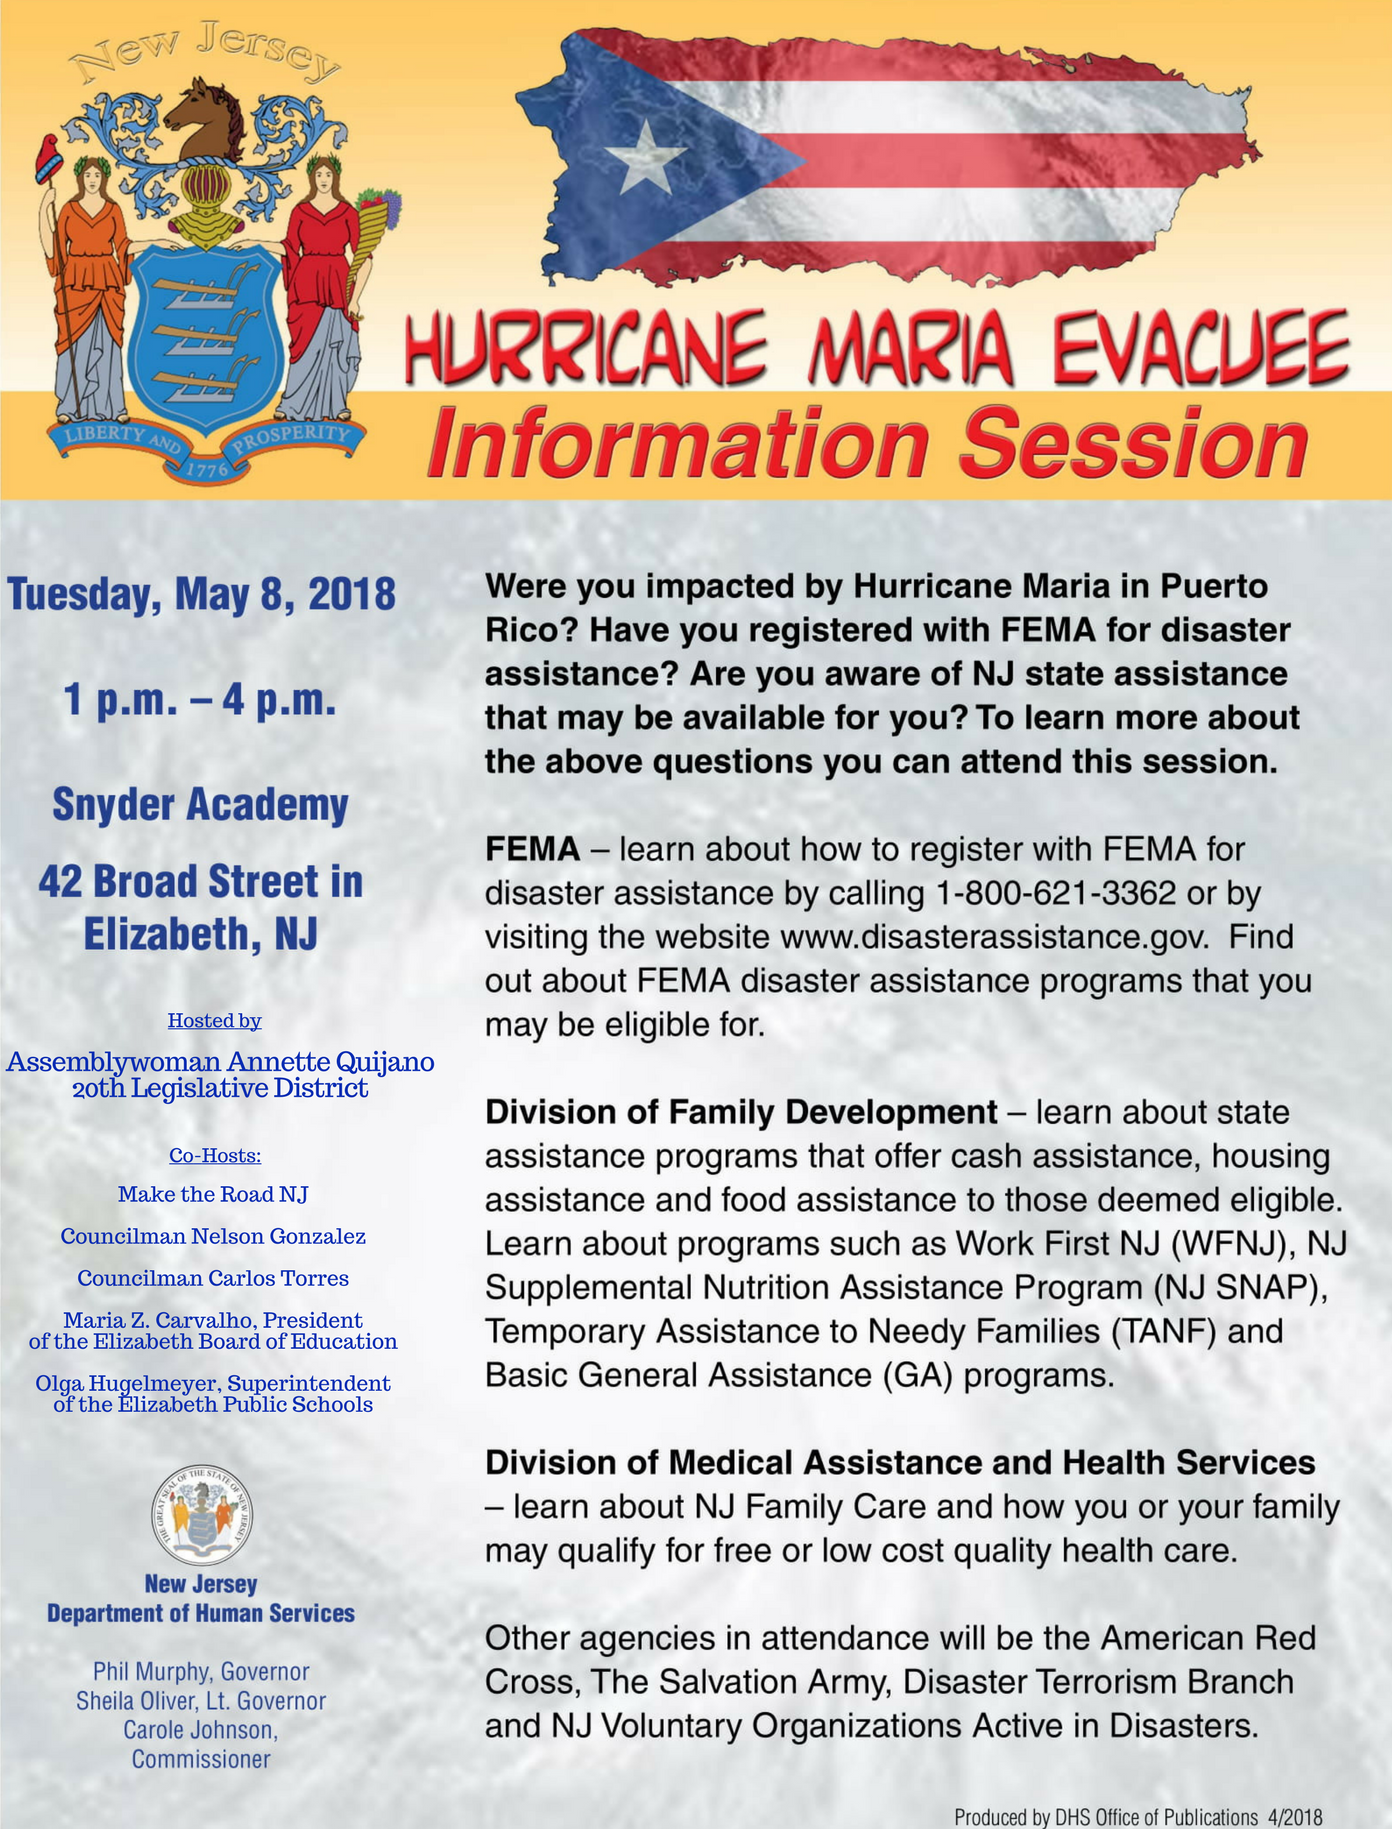 0b5bf0e14707cae7fcaf_Hurricane_Maria_Evacuee_Information_Session_Flyer.jpg